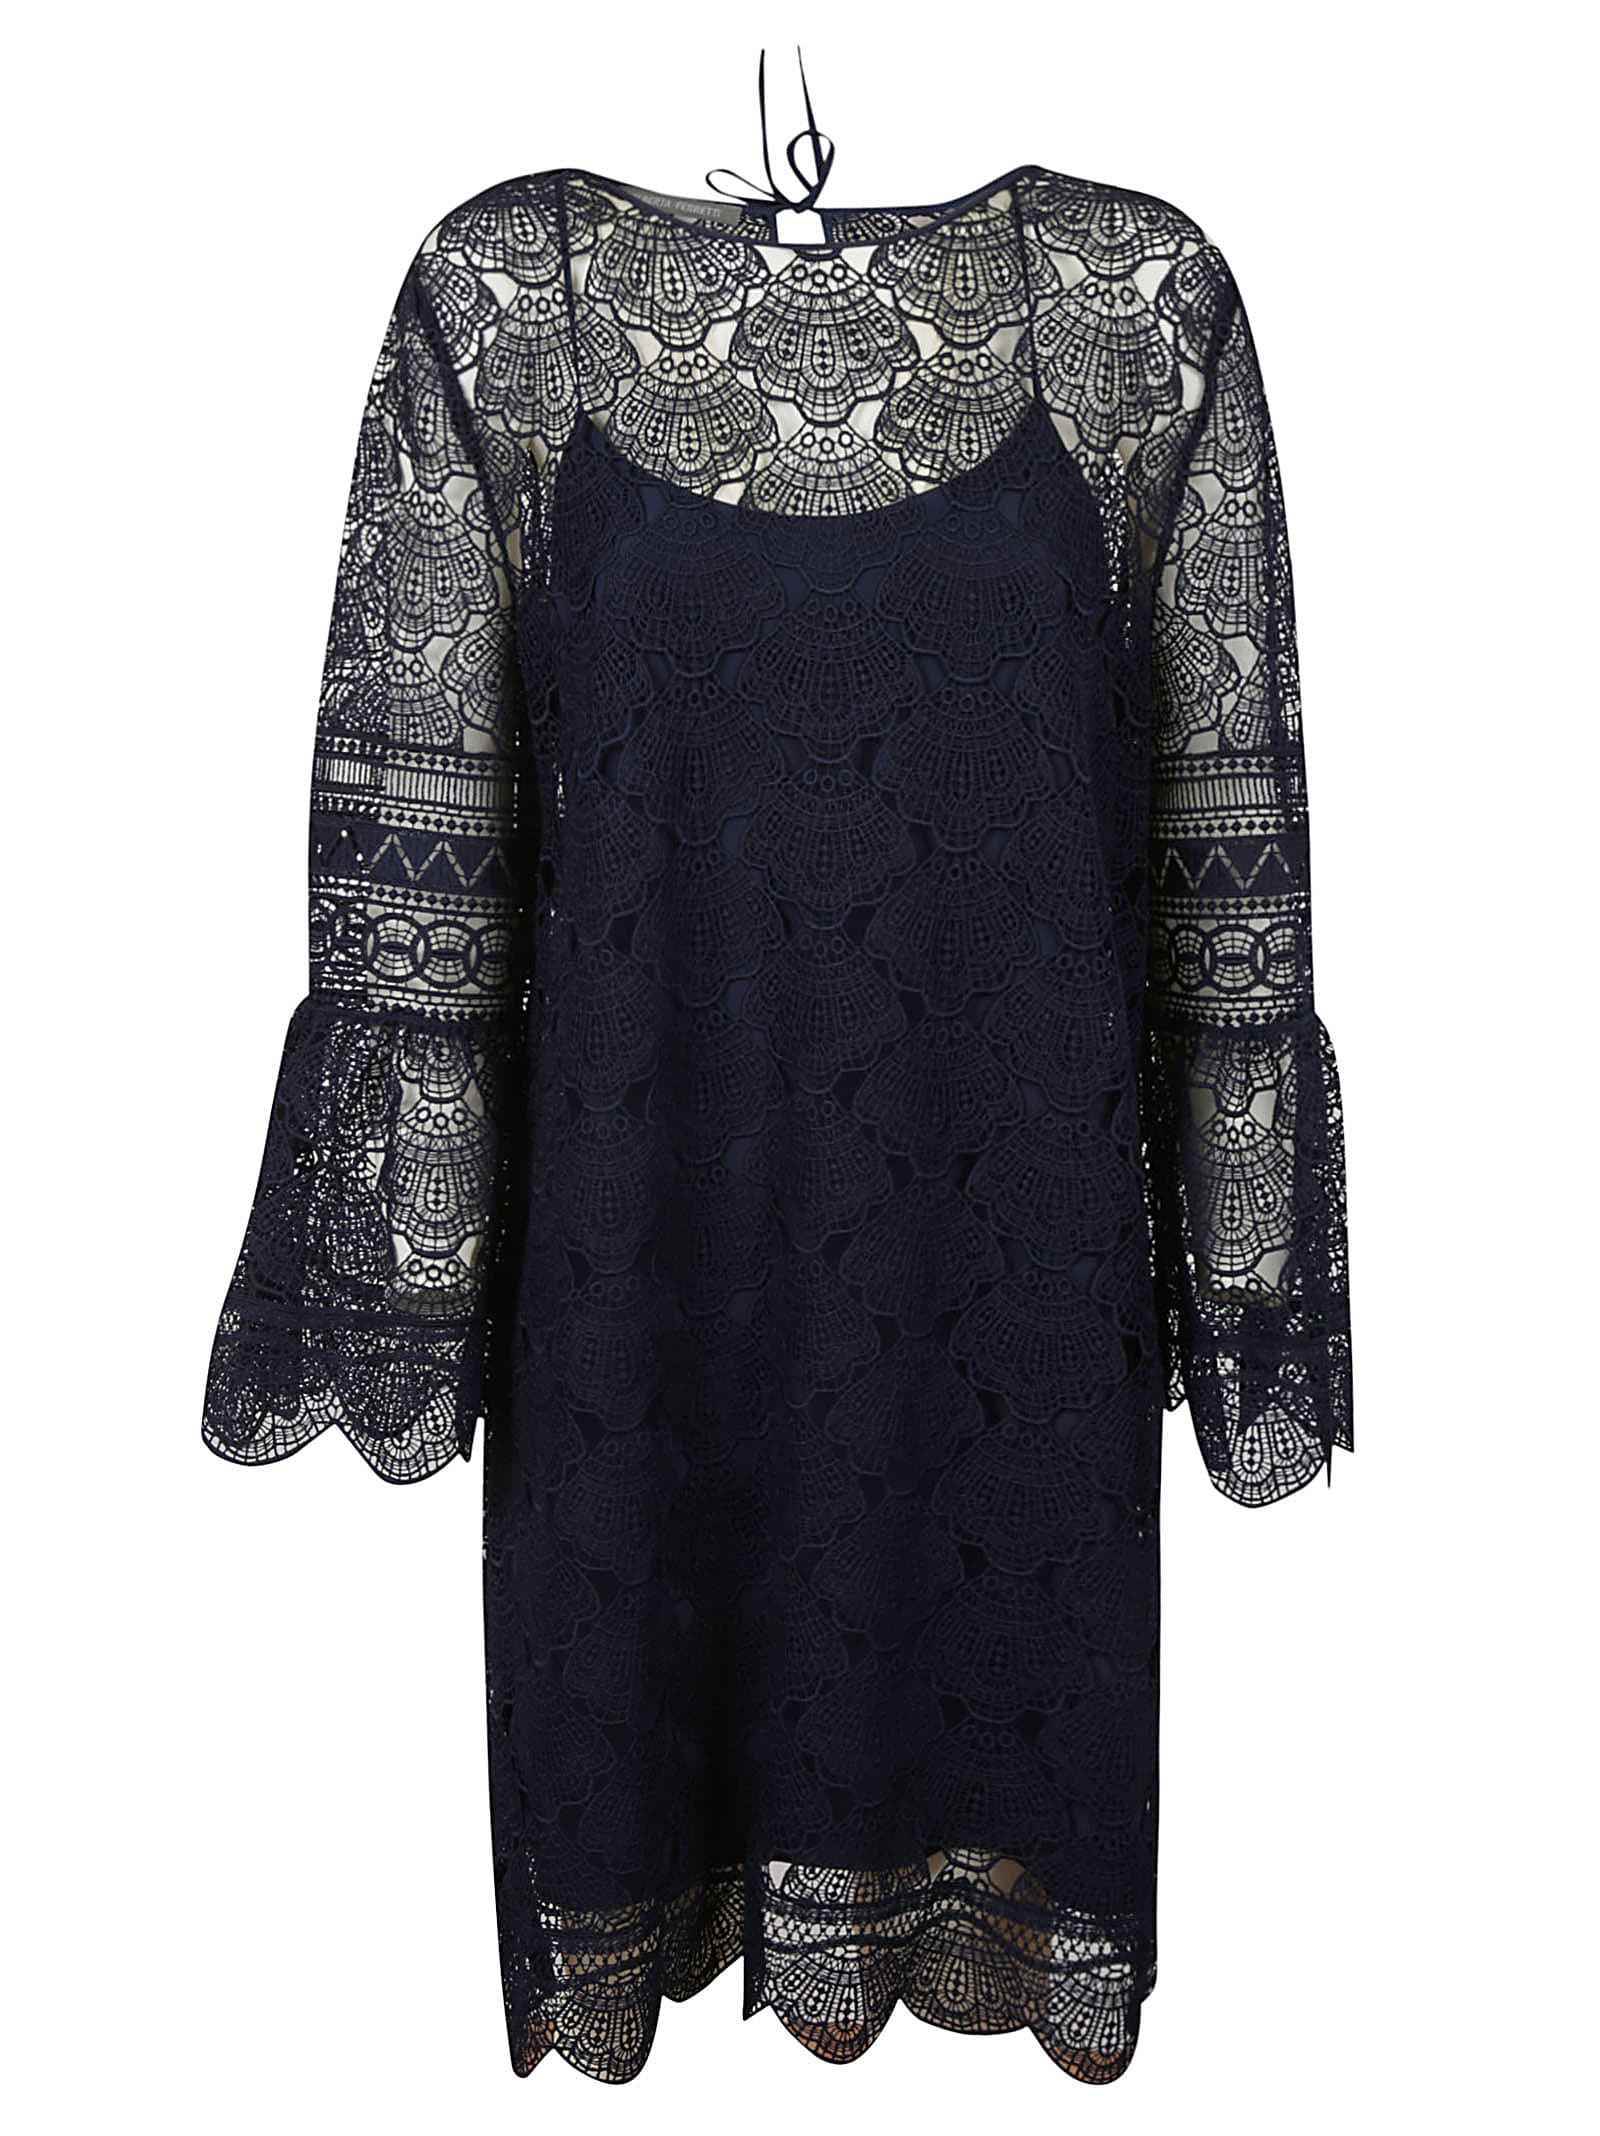 Buy Alberta Ferretti Lace Patterned Dress online, shop Alberta Ferretti with free shipping